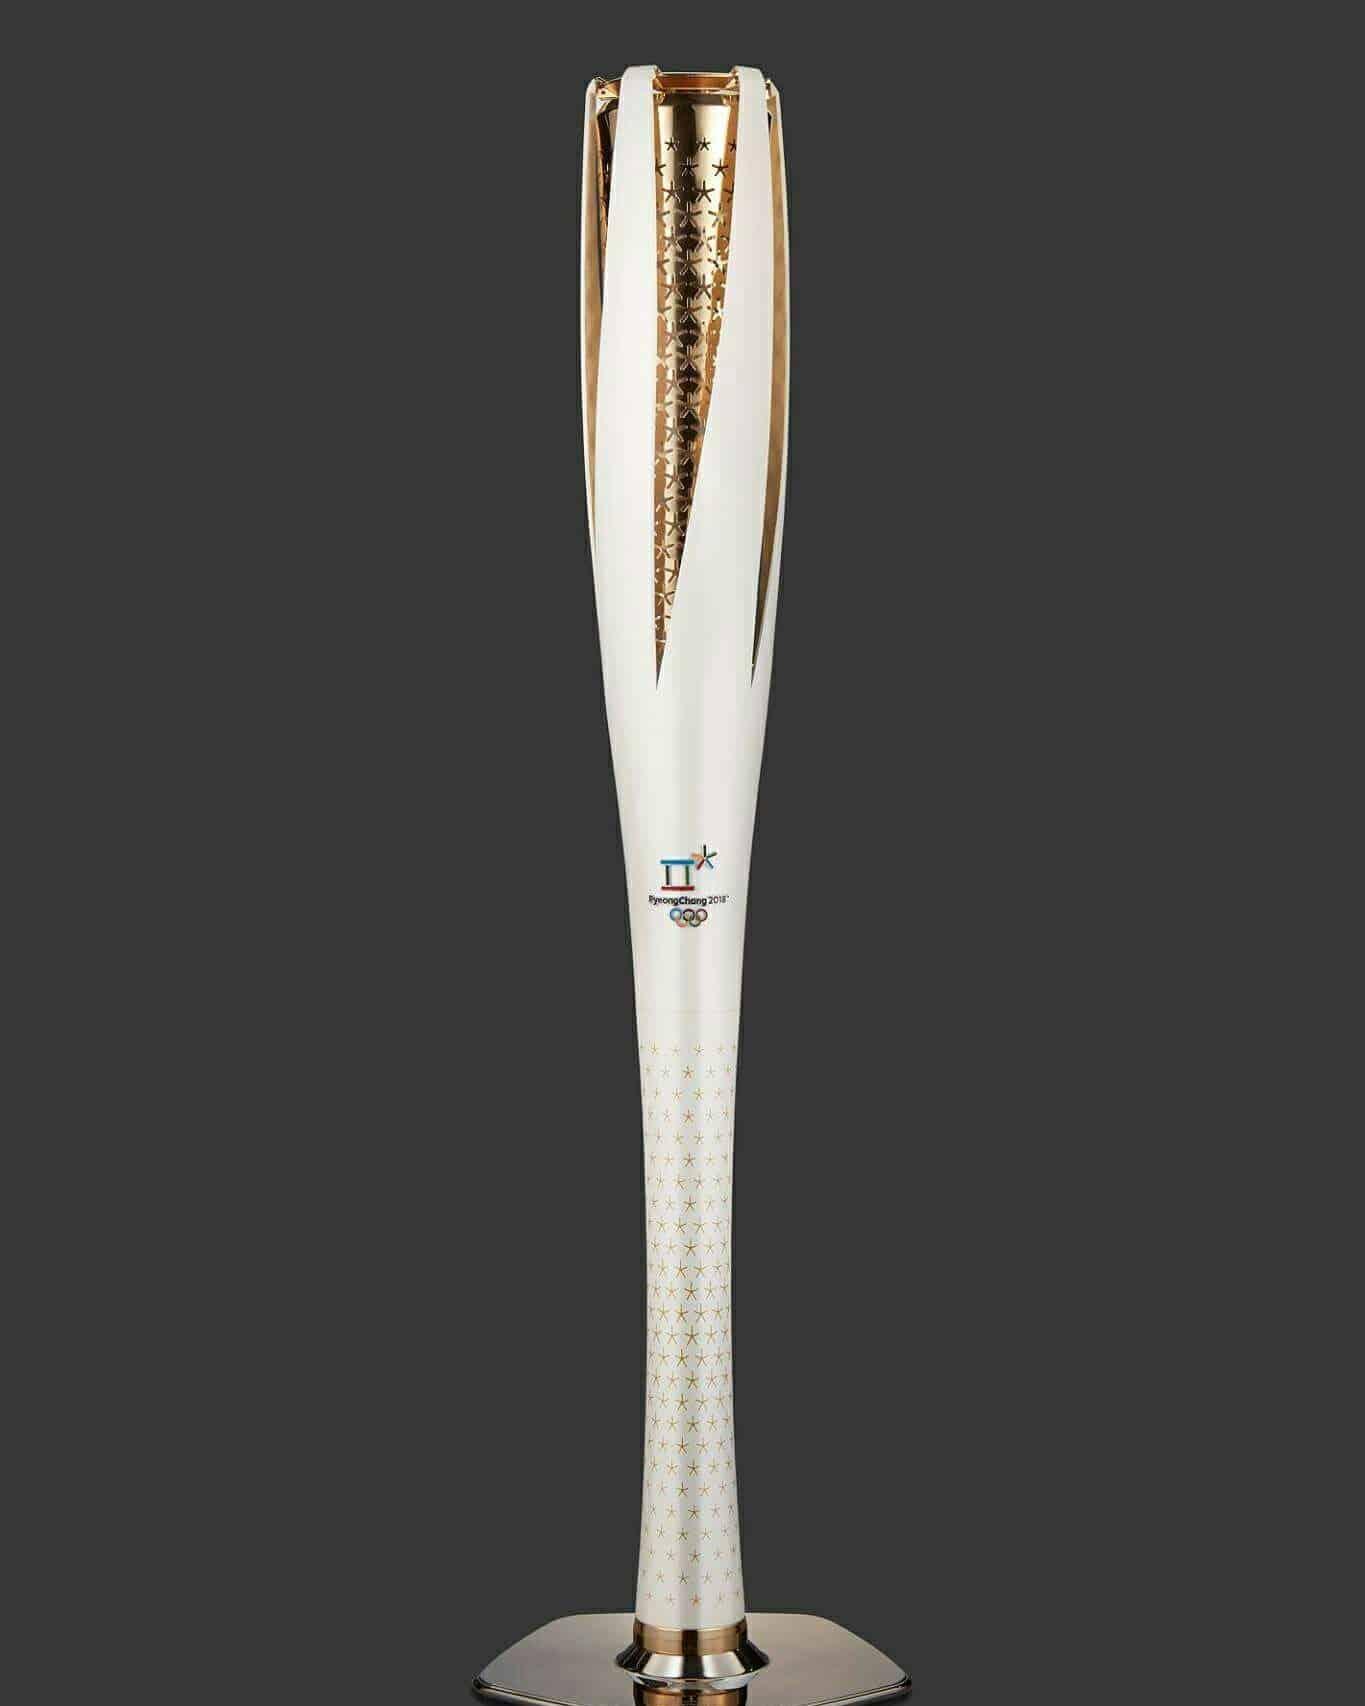 2018 Winter Olympics torch